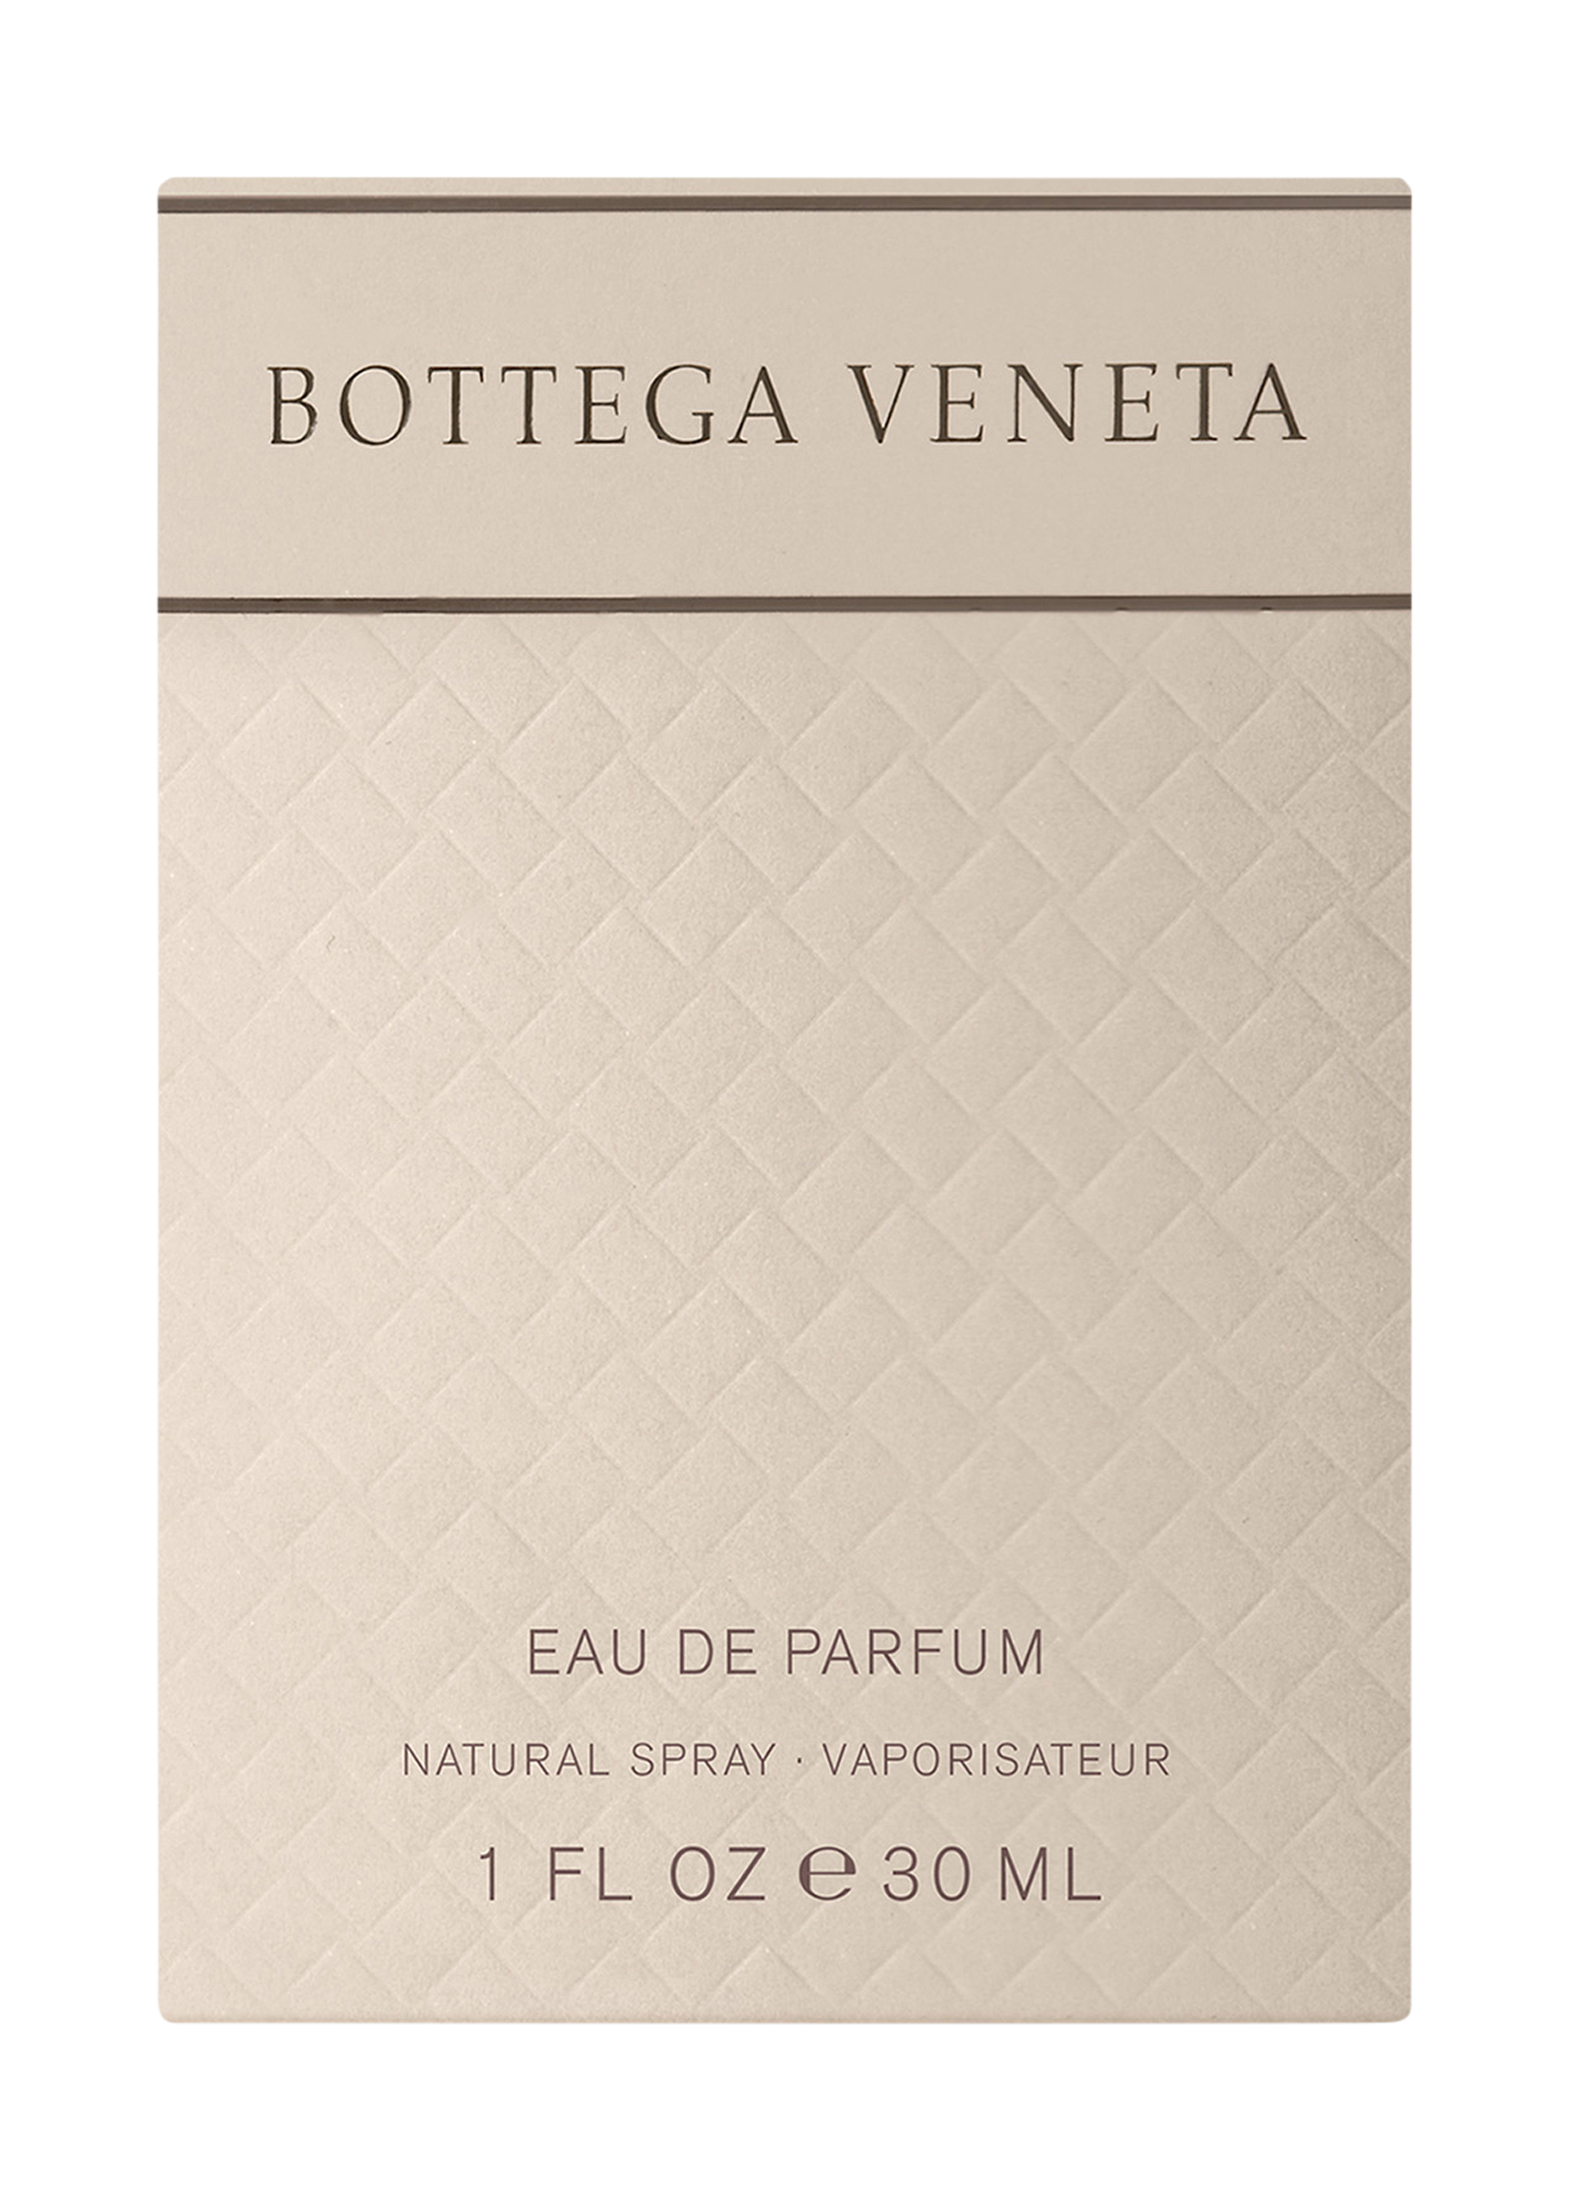 BOTTEGA VENETA, EDP NATURAL SPRAY 30ML image number 1